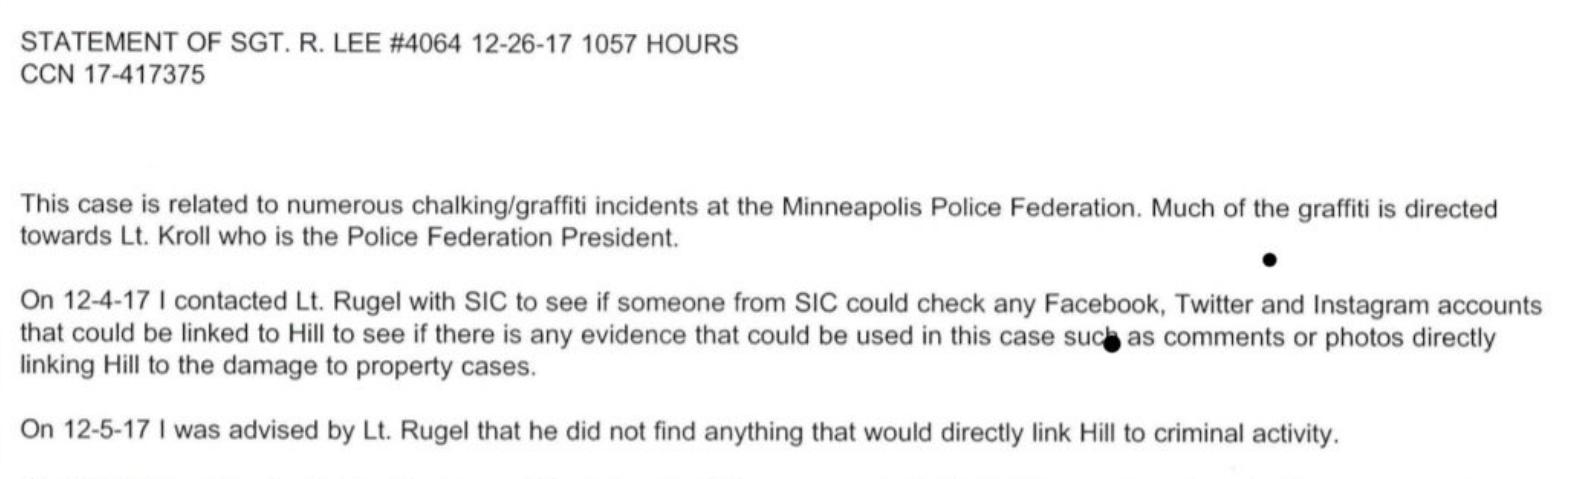 Police Fusion Center Tied to Fake Social Media Accounts